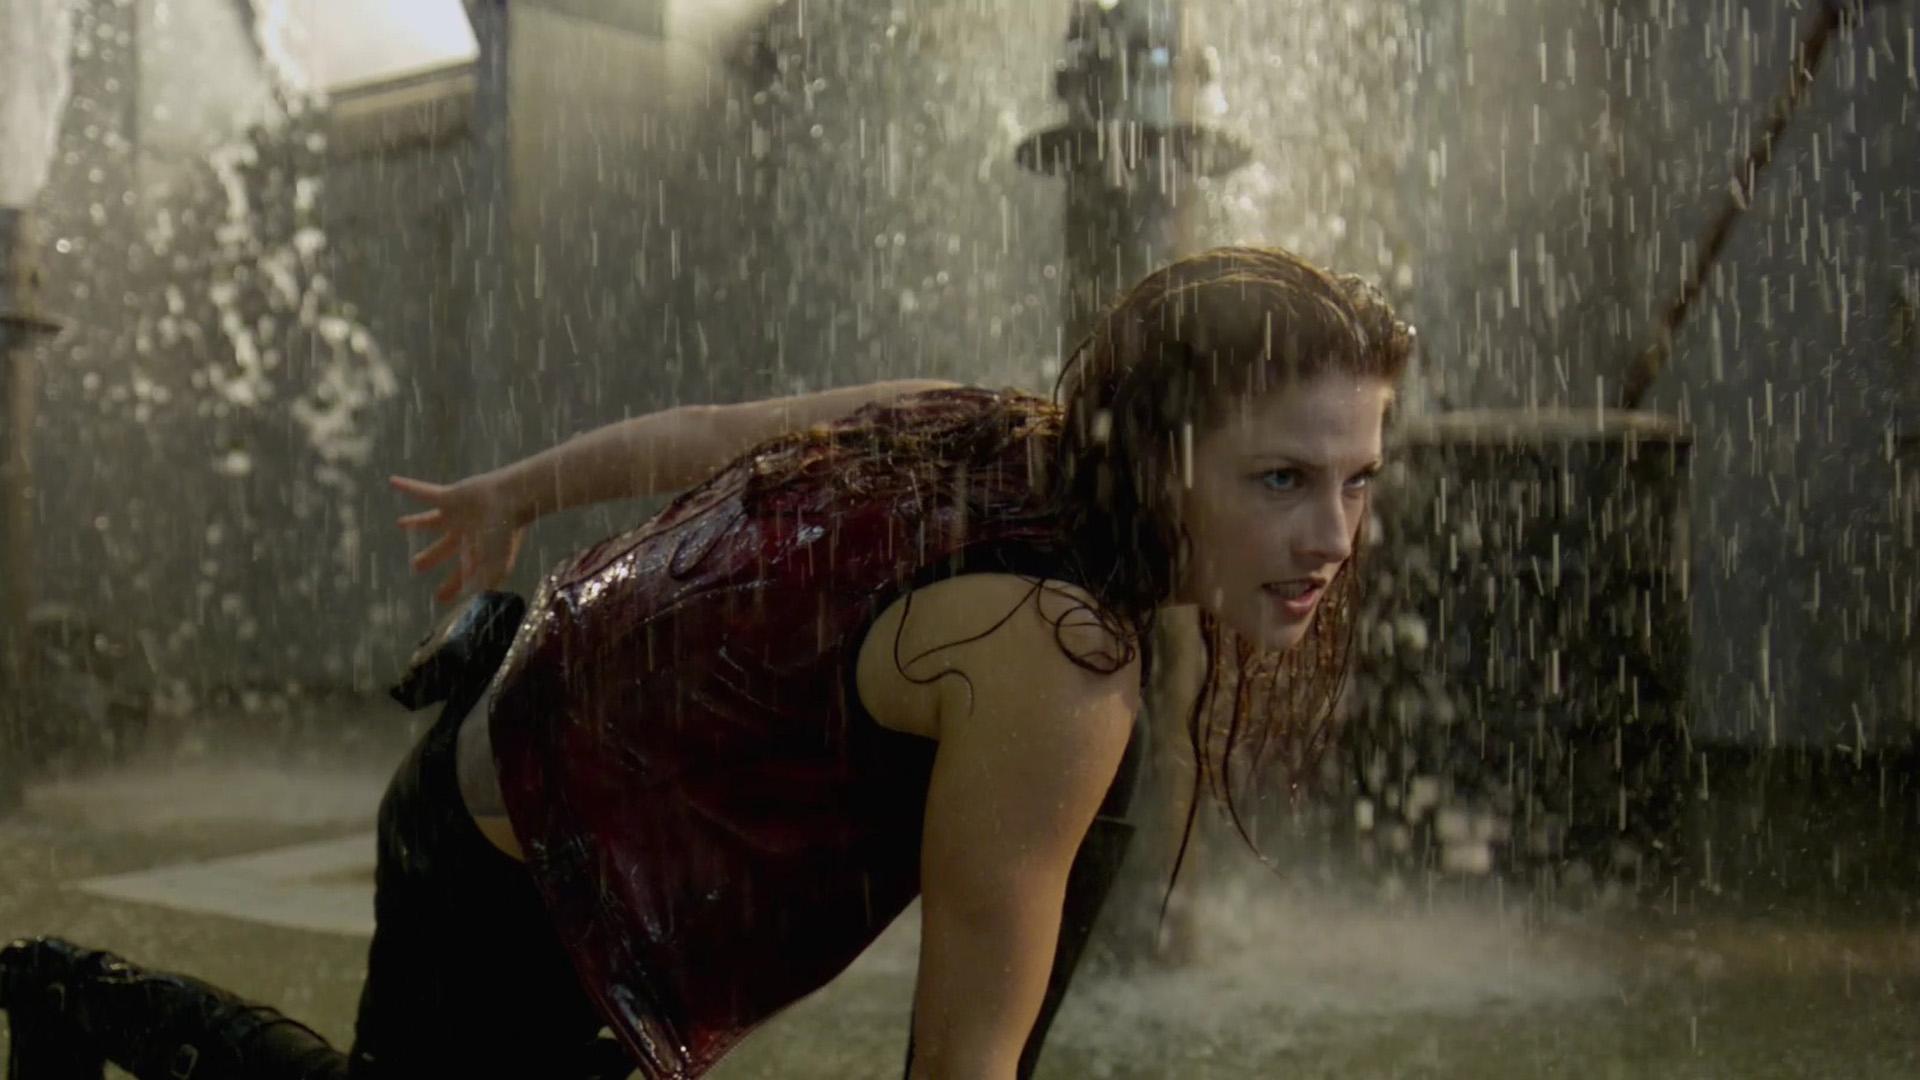 xpx Resident Evil Afterlife